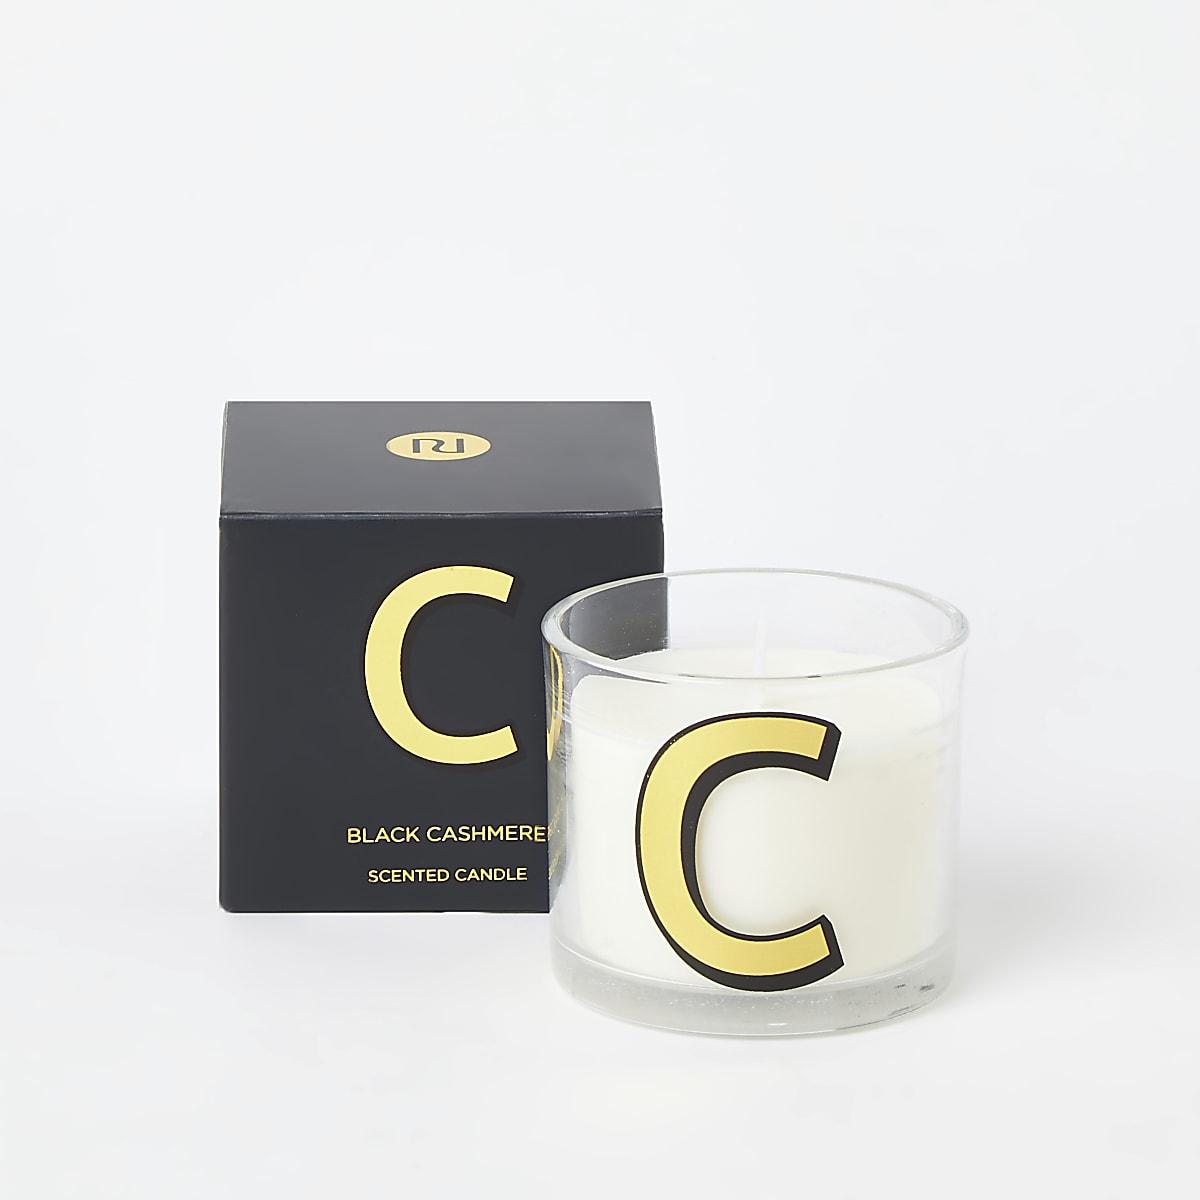 Navy 'C' alphabet black cashmere candle